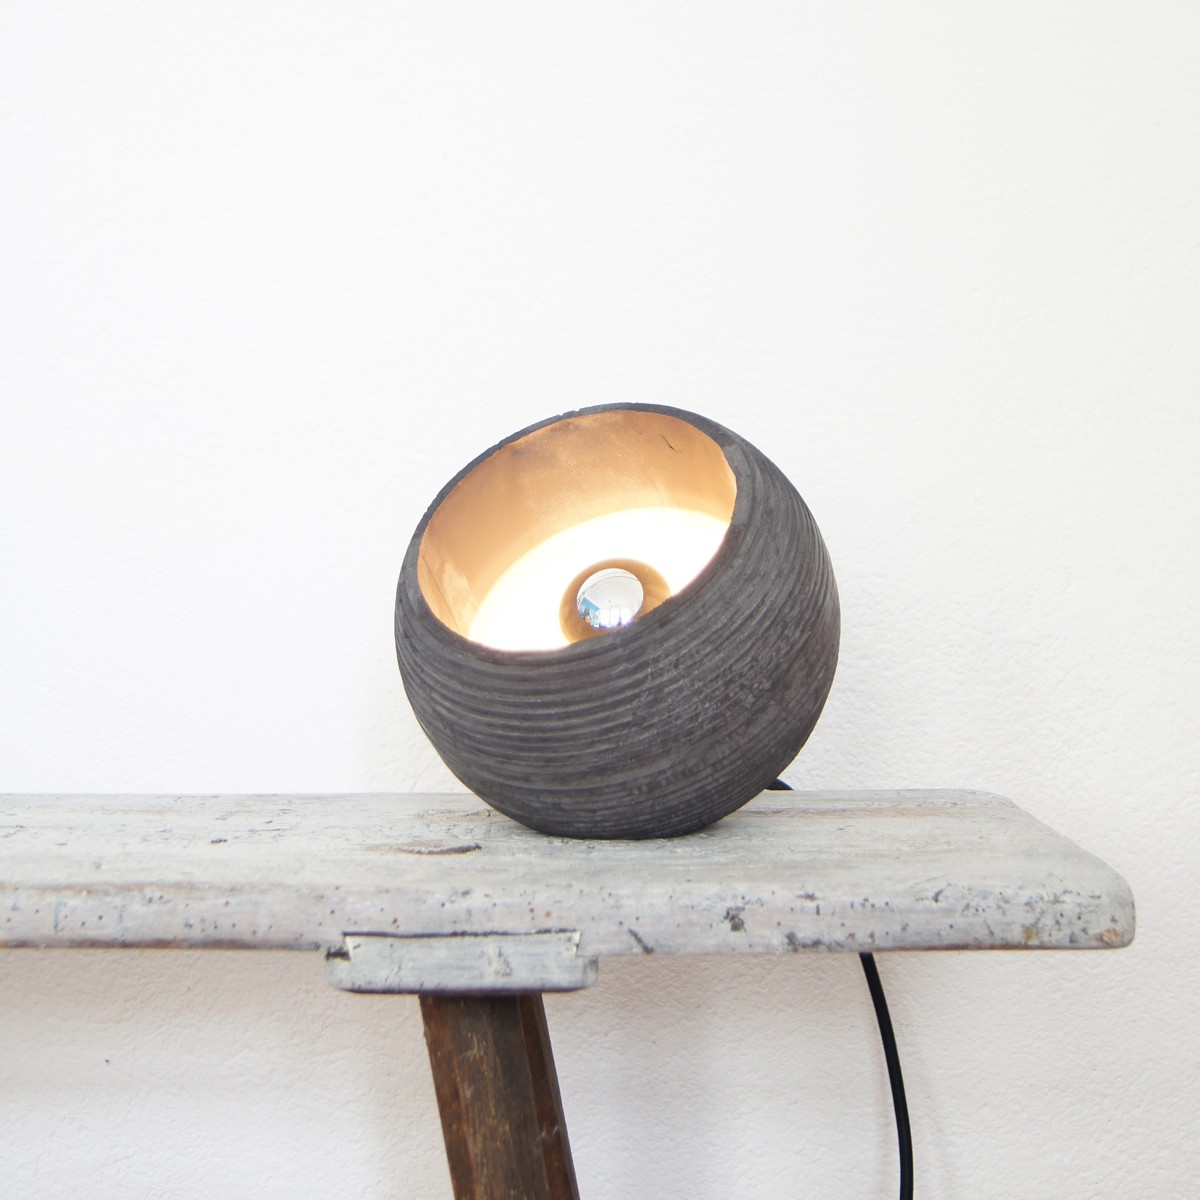 nminus1 beton stehlampe tischlampe in verschiedenen farben. Black Bedroom Furniture Sets. Home Design Ideas